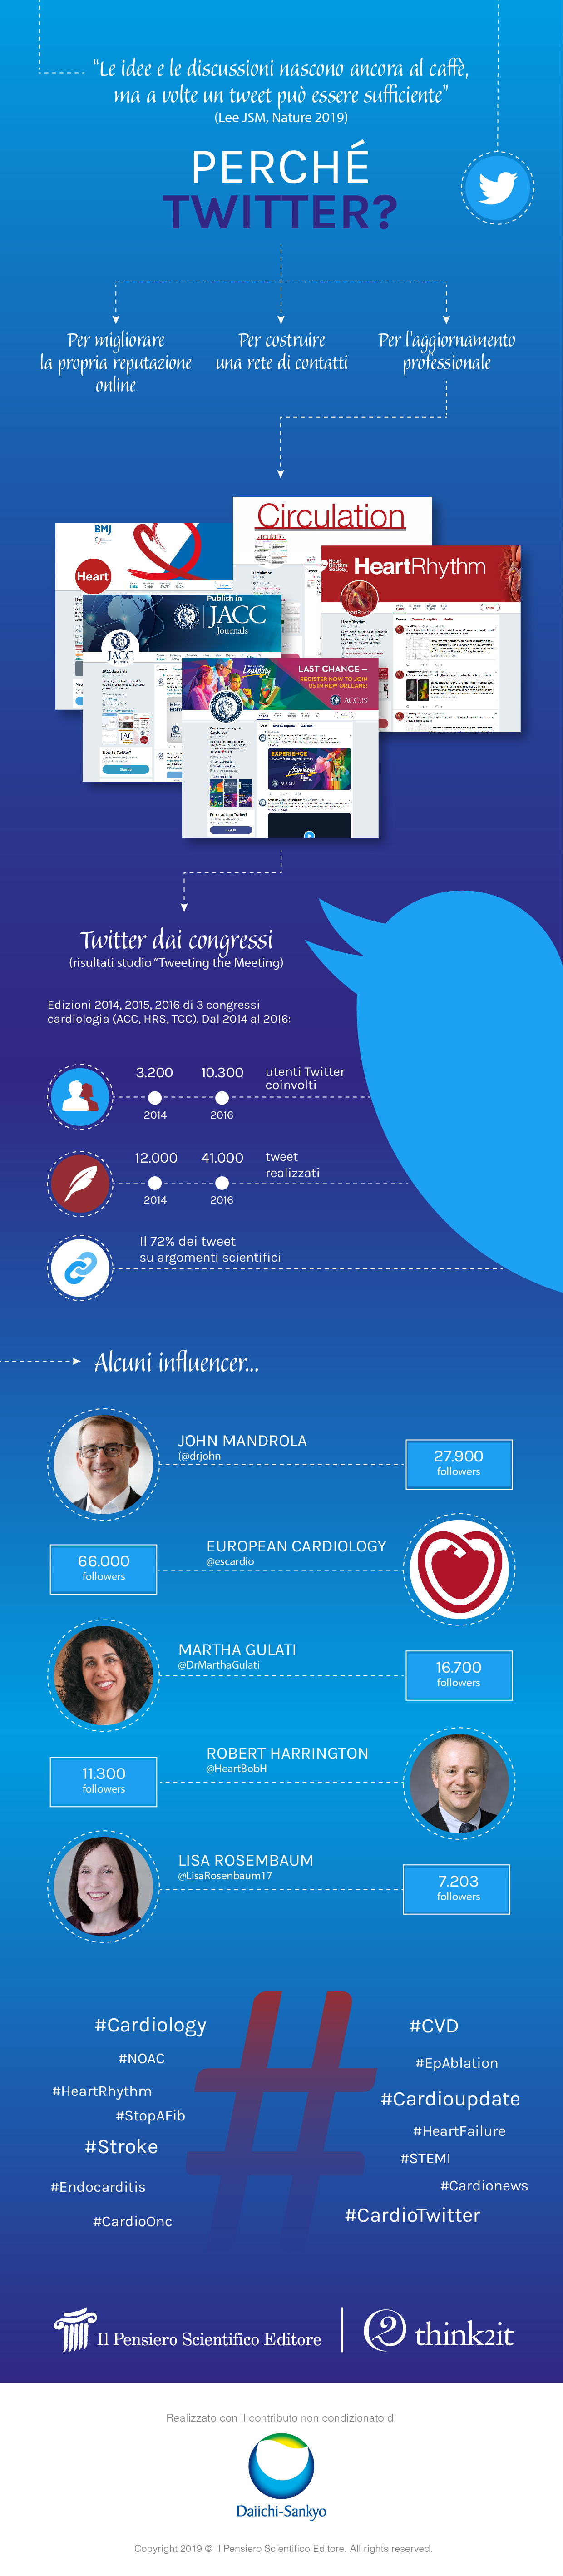 infografica_percheTwitter